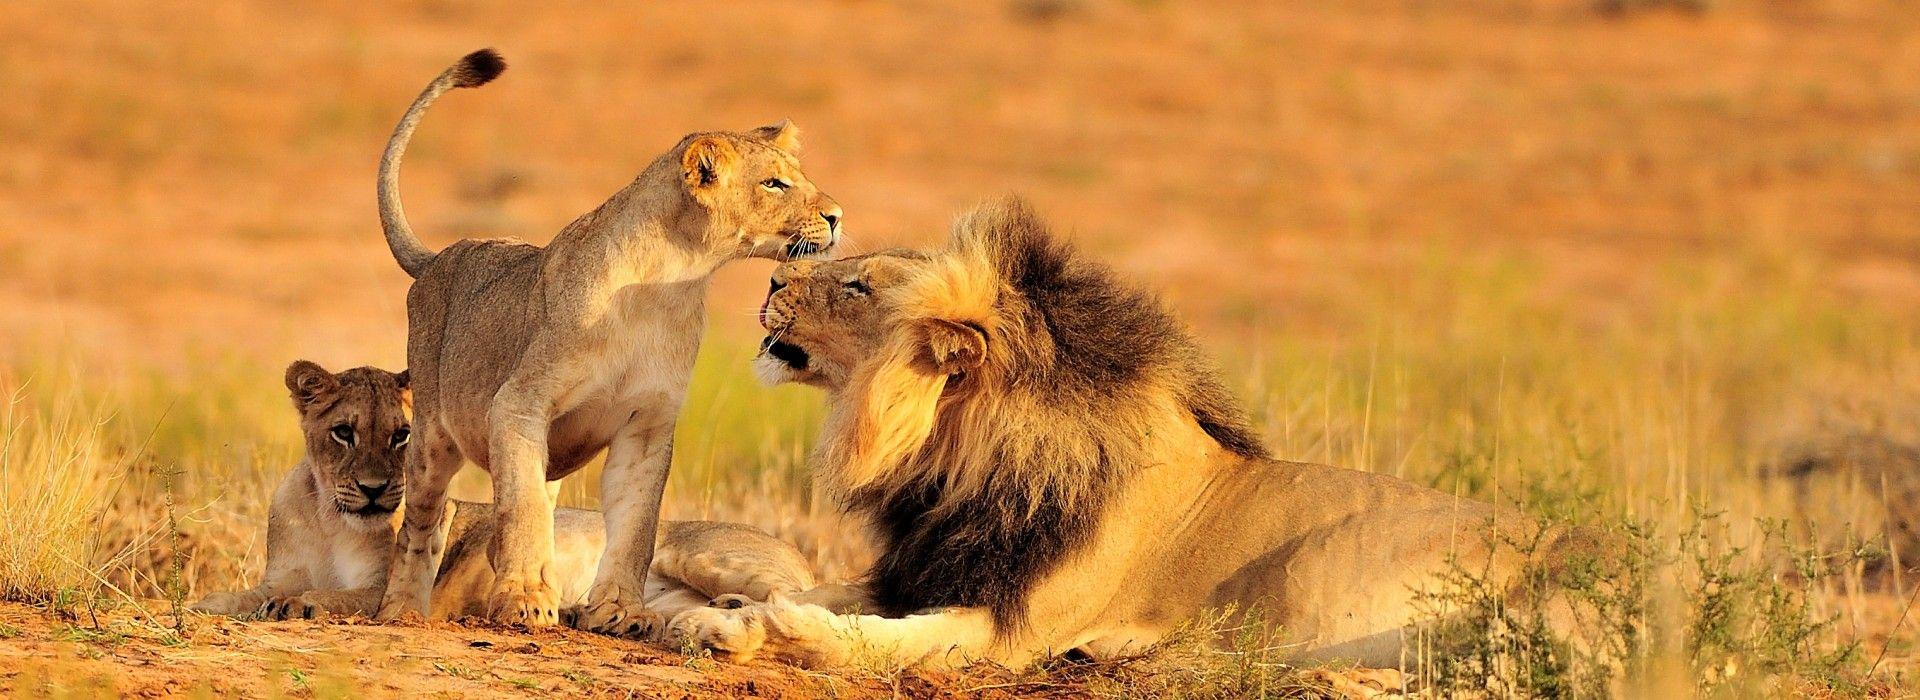 Wildlife, landscapes and nature Tours in Kruger National Park